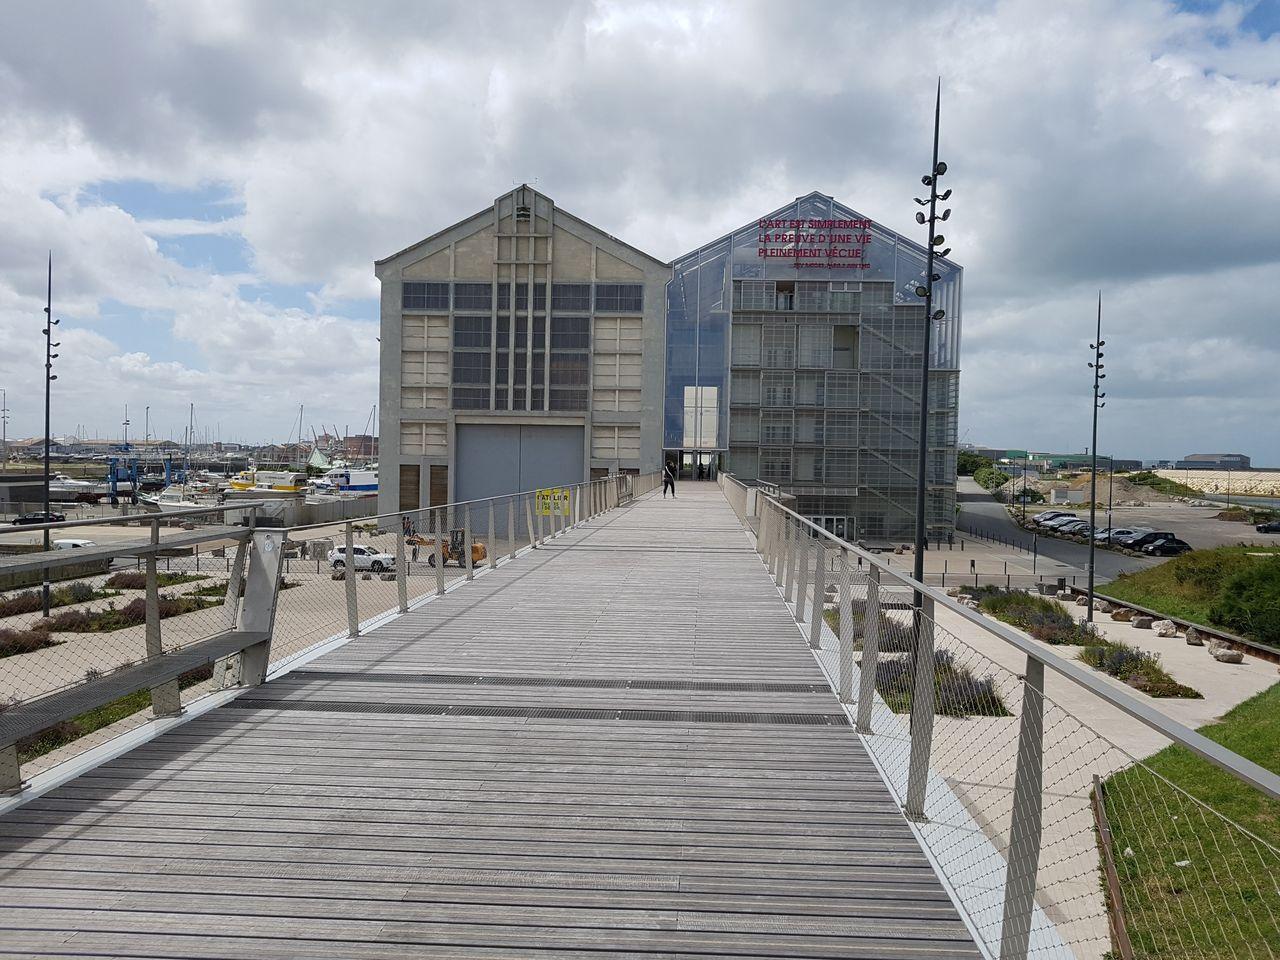 Fond Régional d'Art Contemporain de Dunkerque